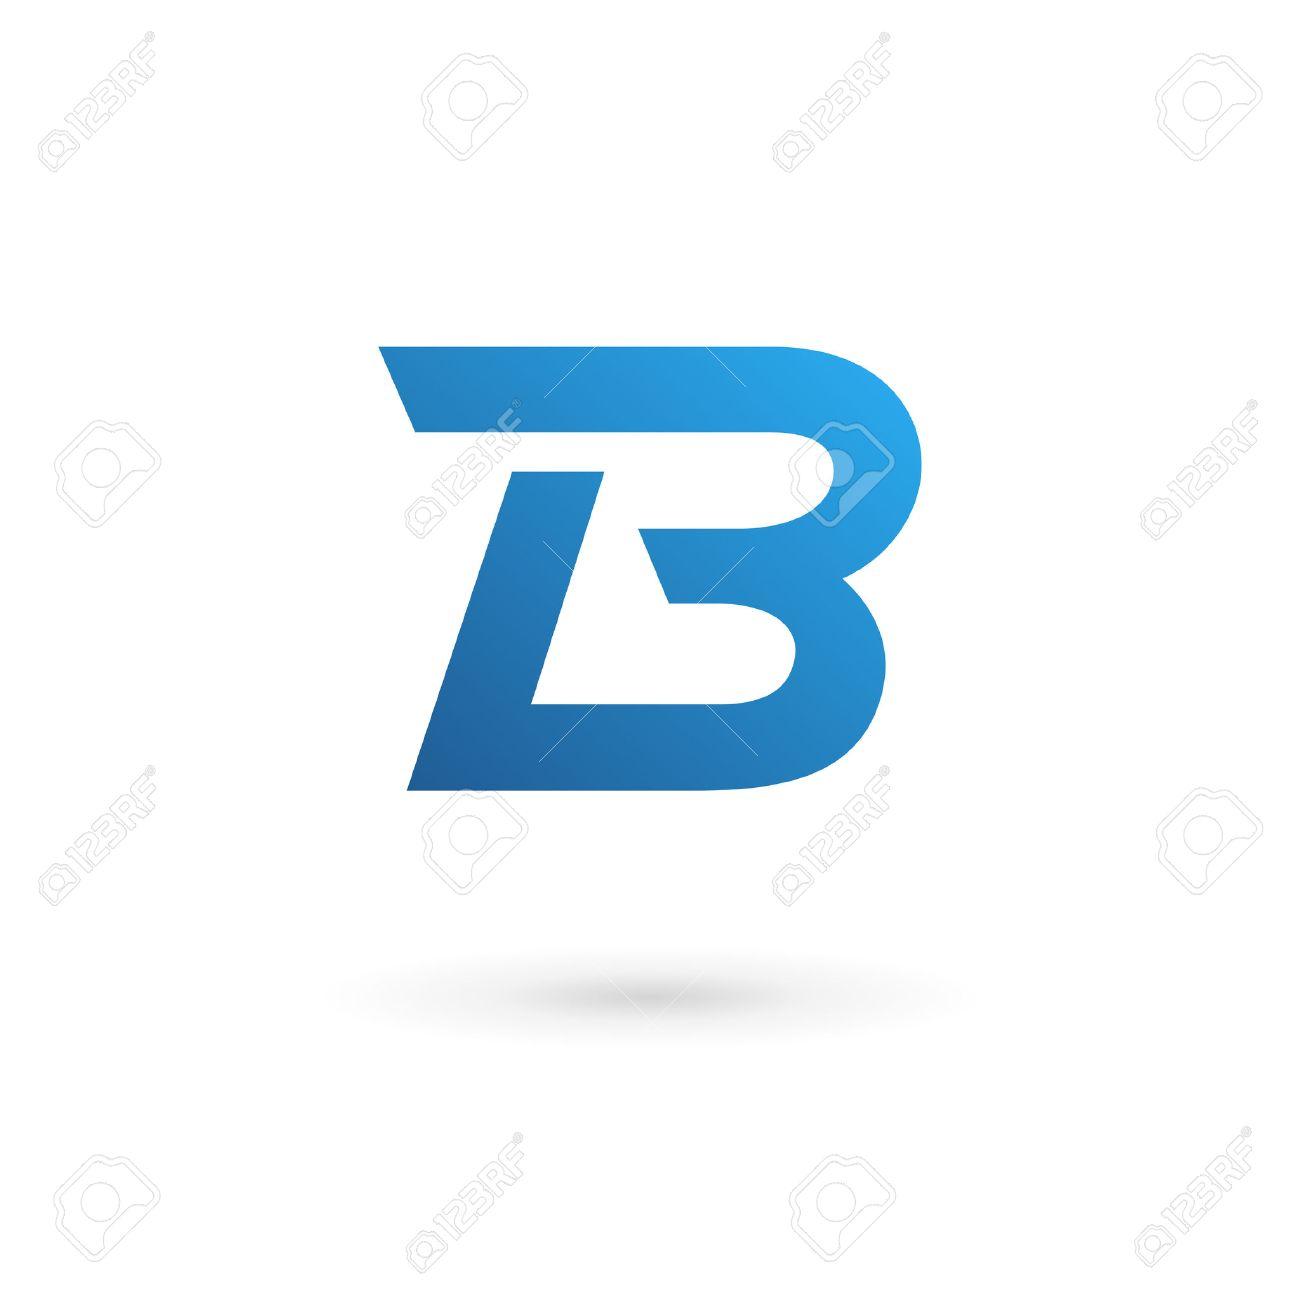 letter b logo icon design template elements stock vector 32592464